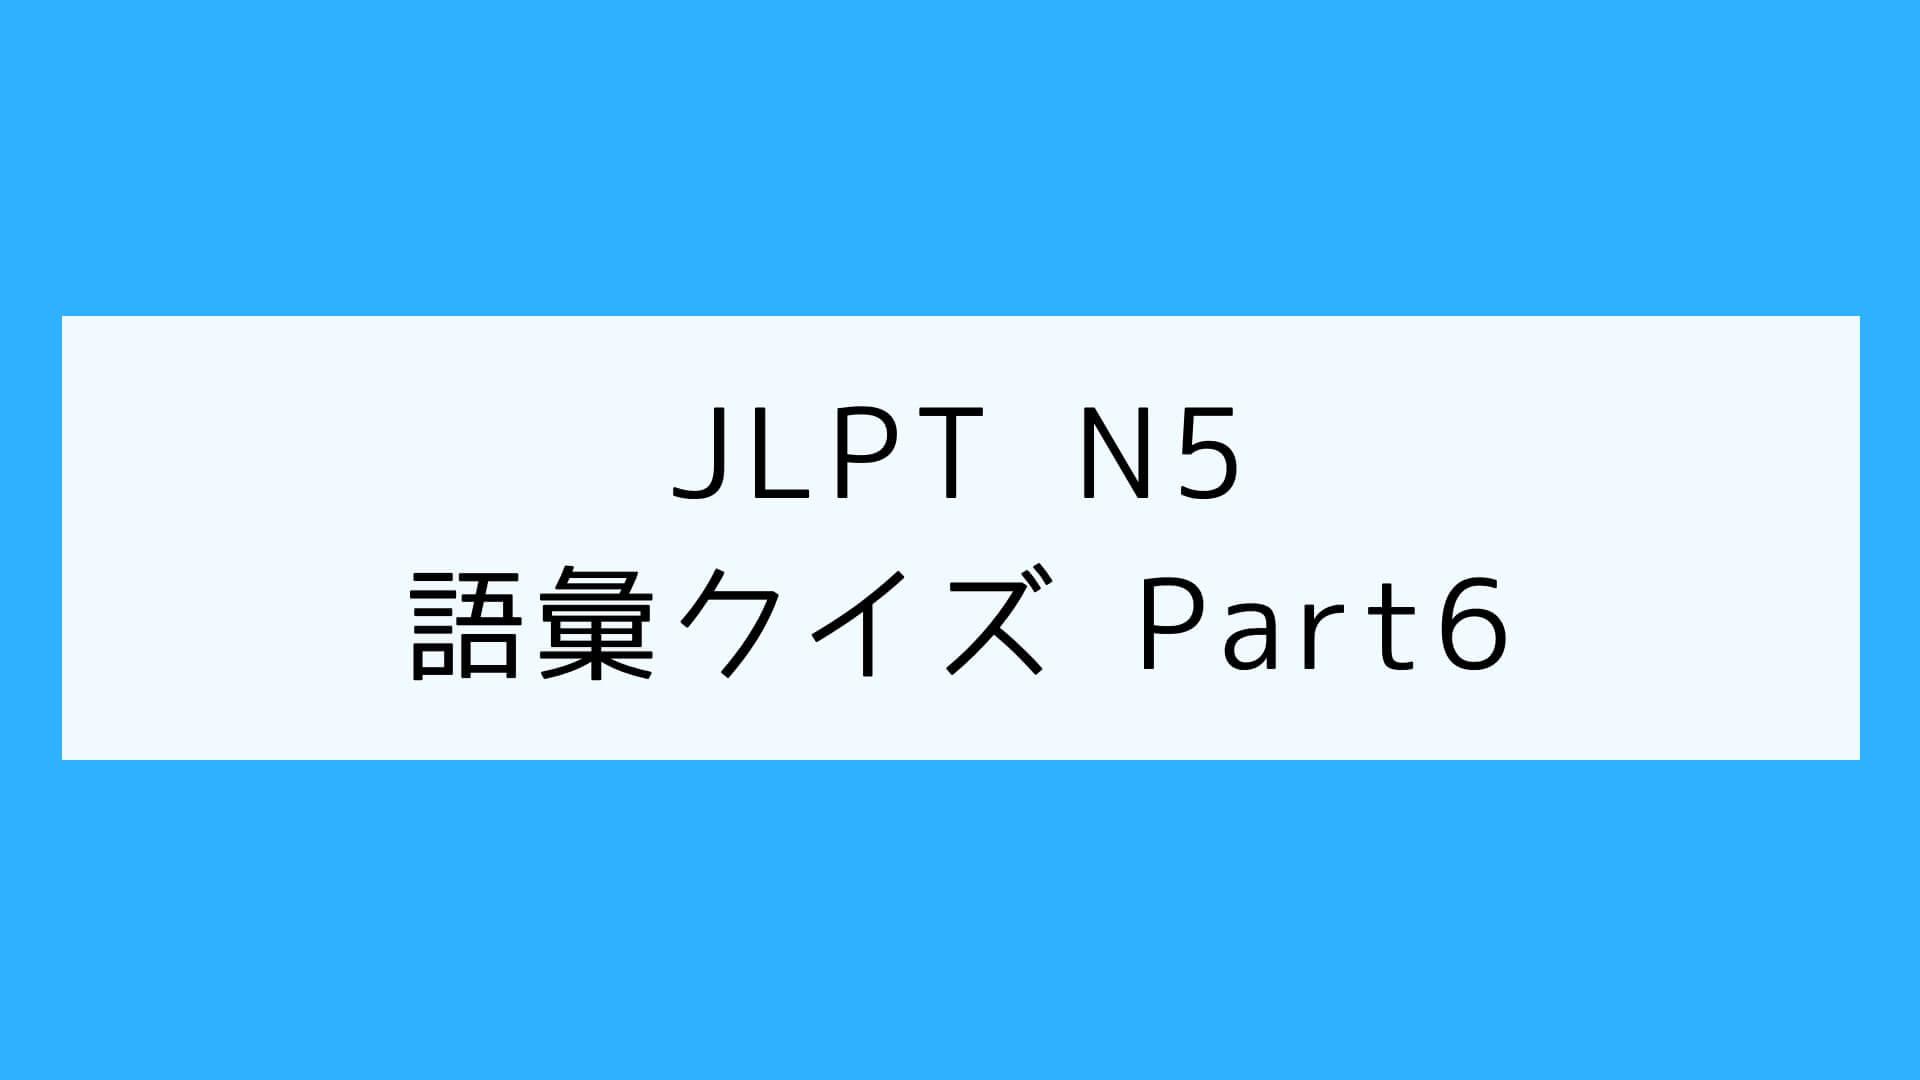 【JLPT N5】語彙クイズ Part6